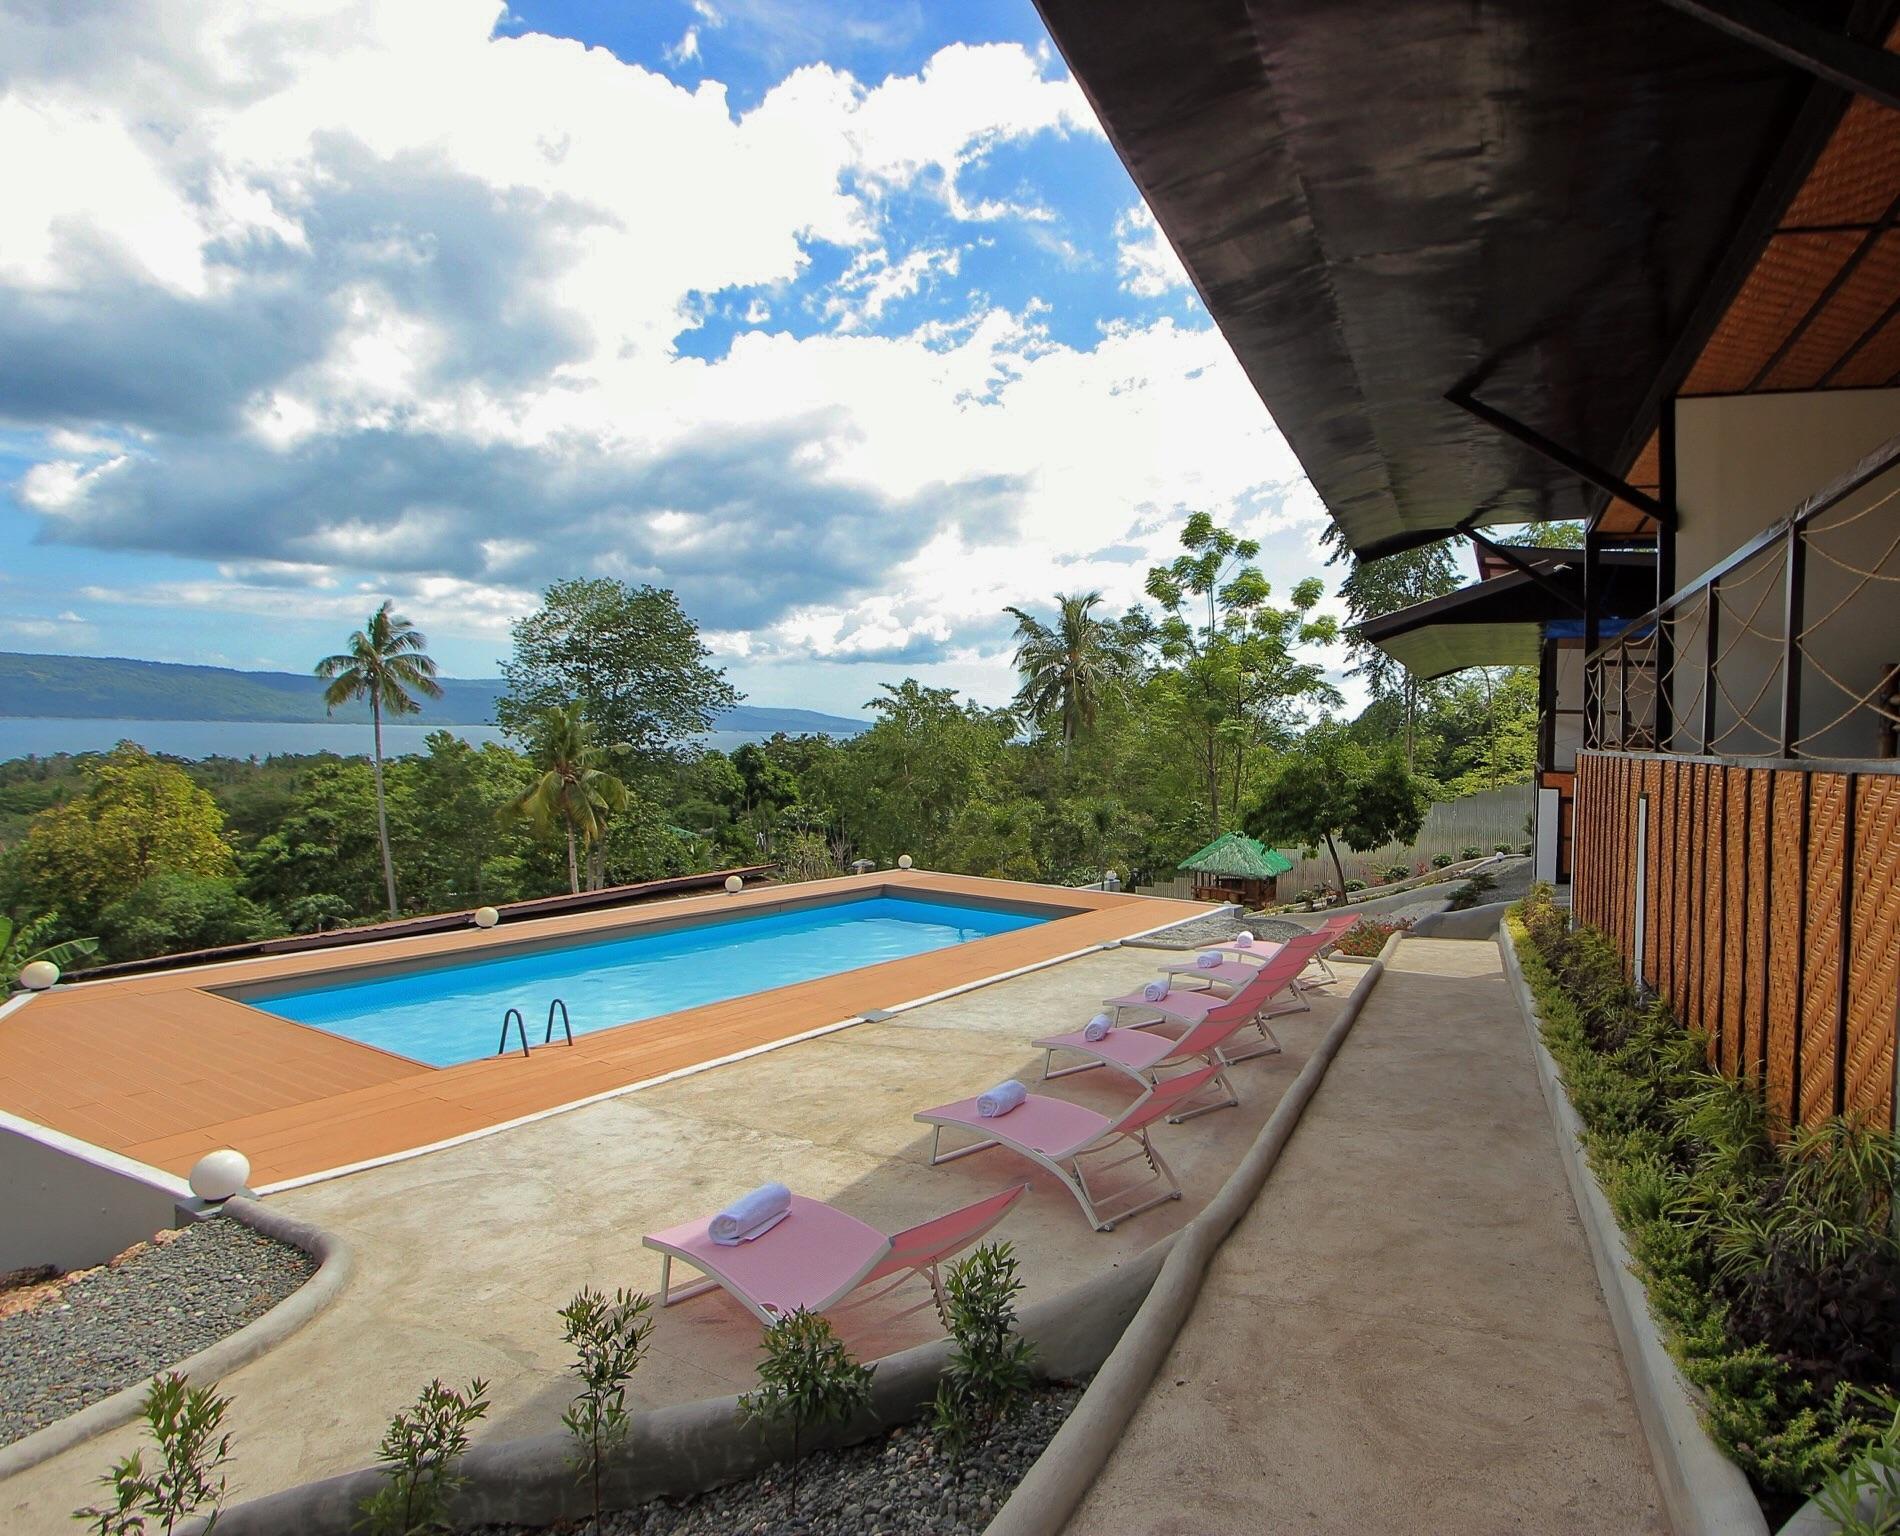 Seascape Inland Resort